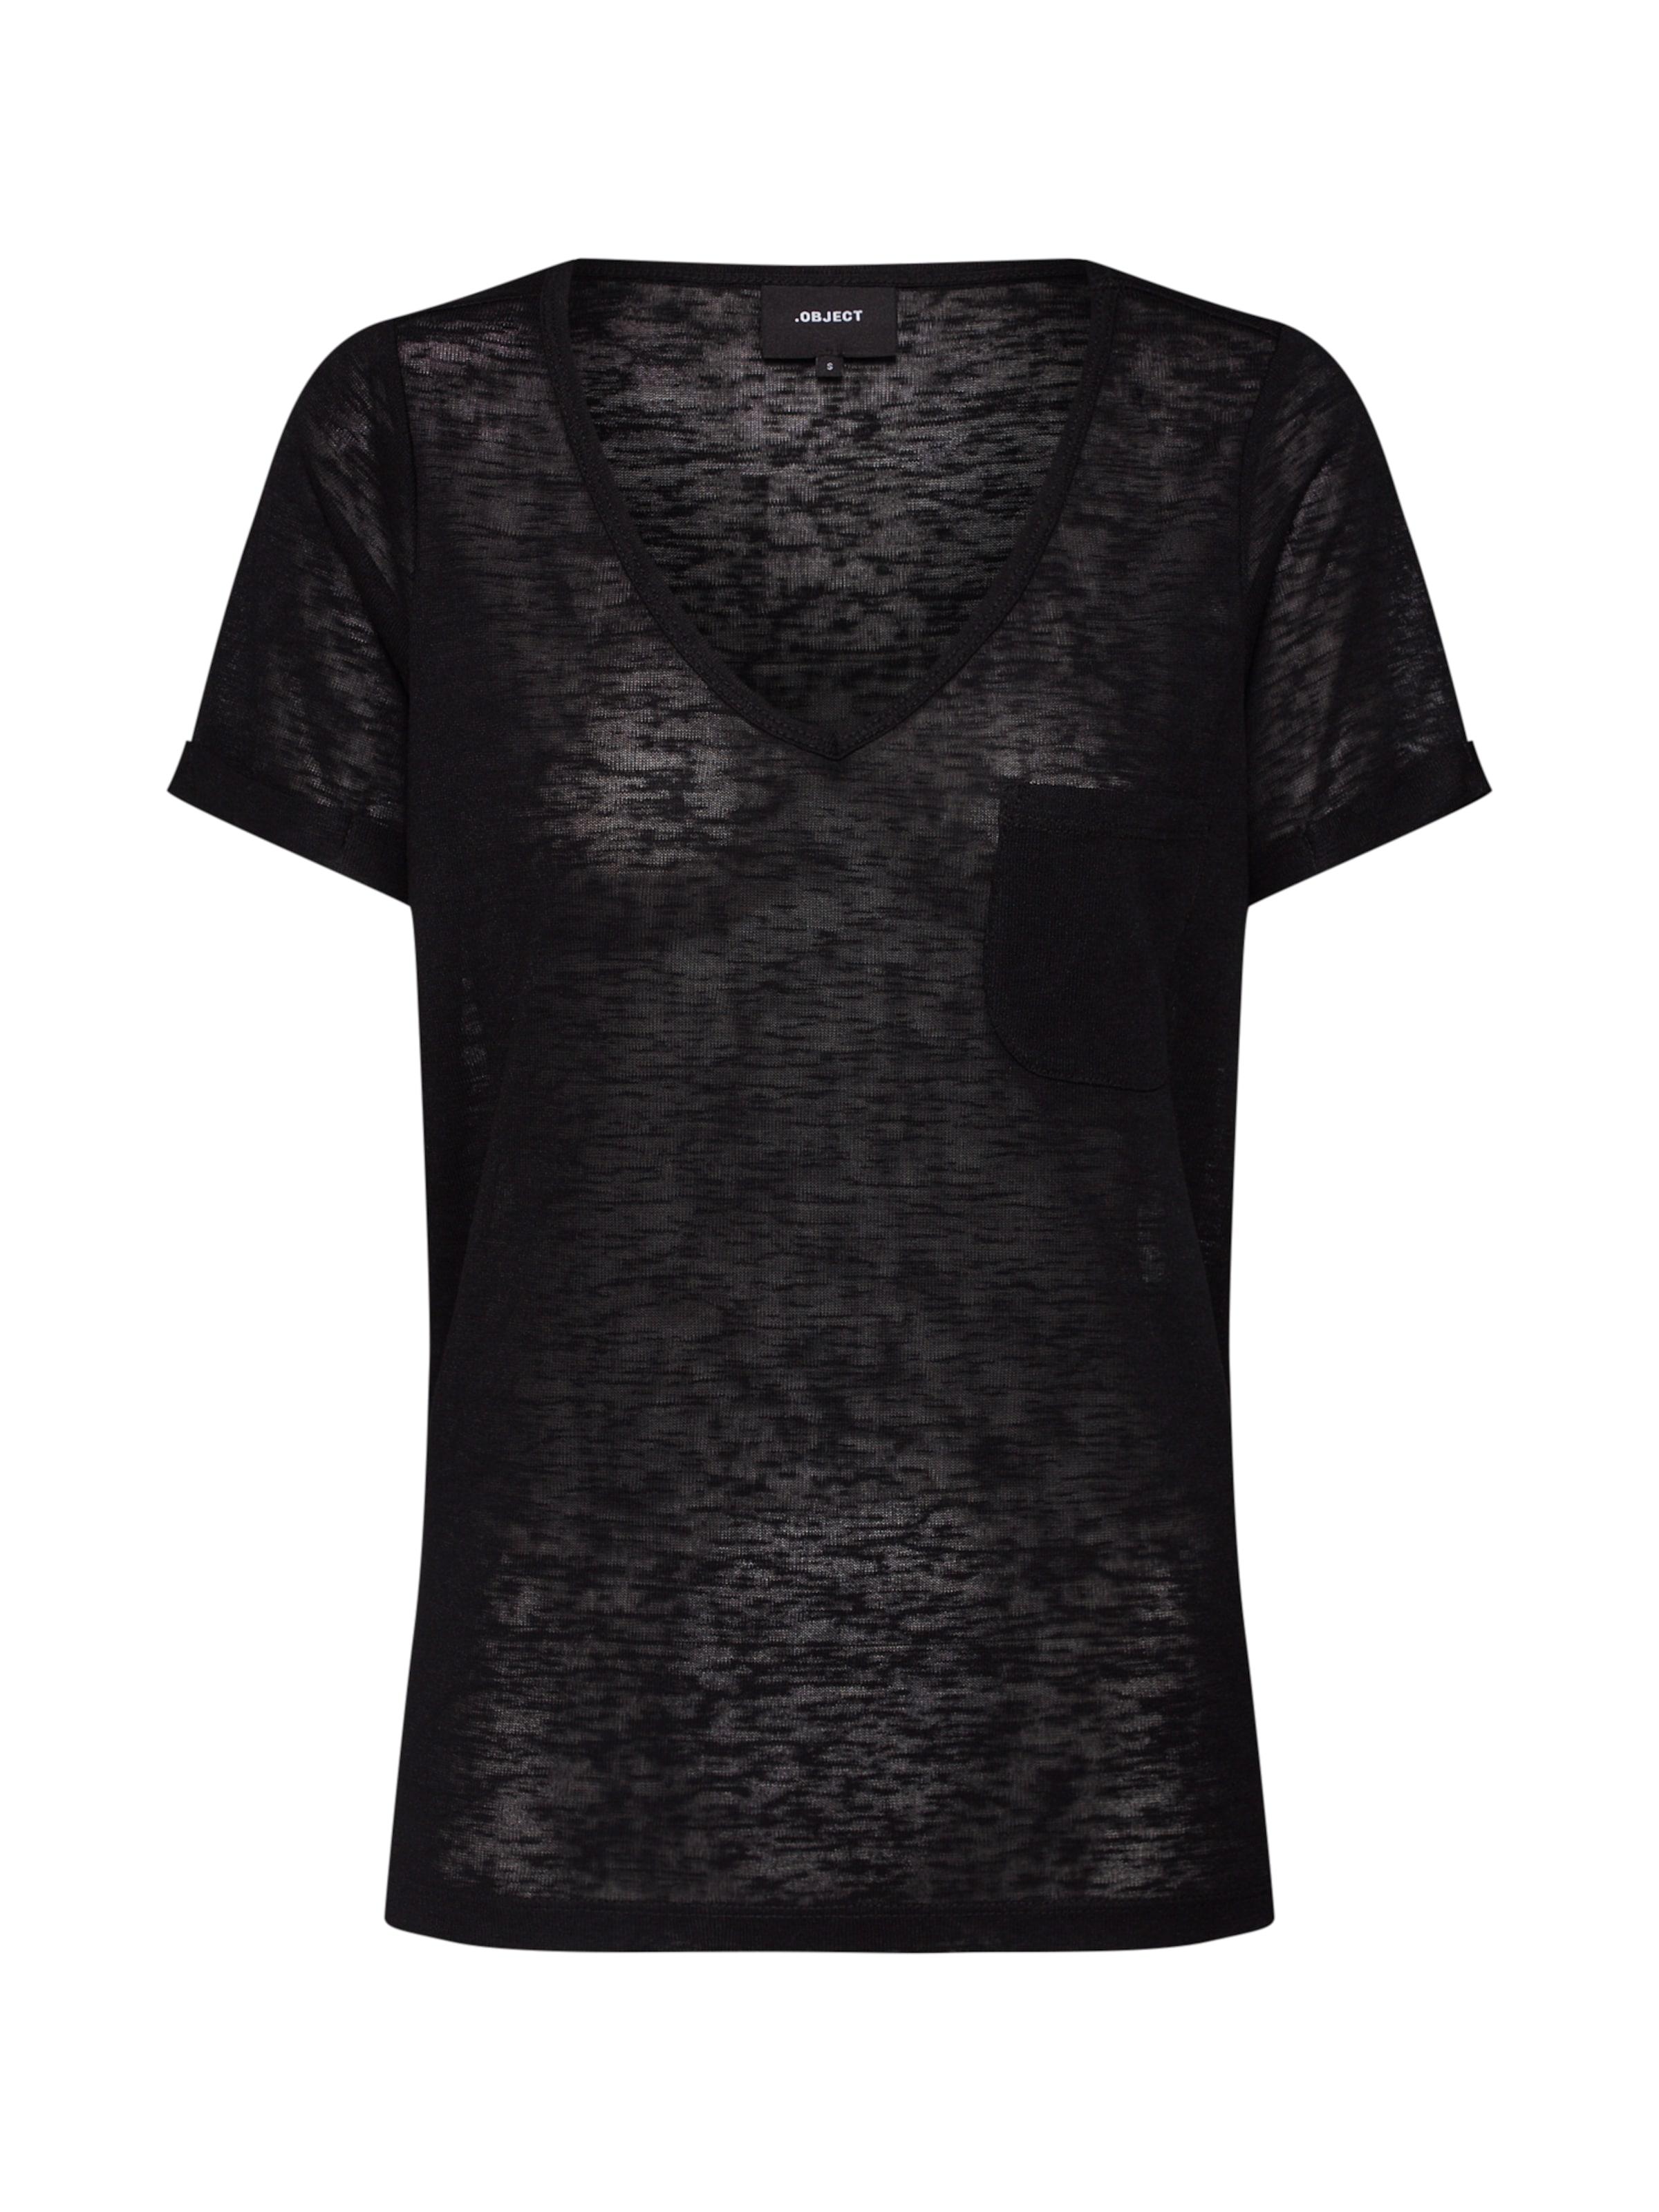 En T 'objtessi' Noir Object shirt QthCsdxr